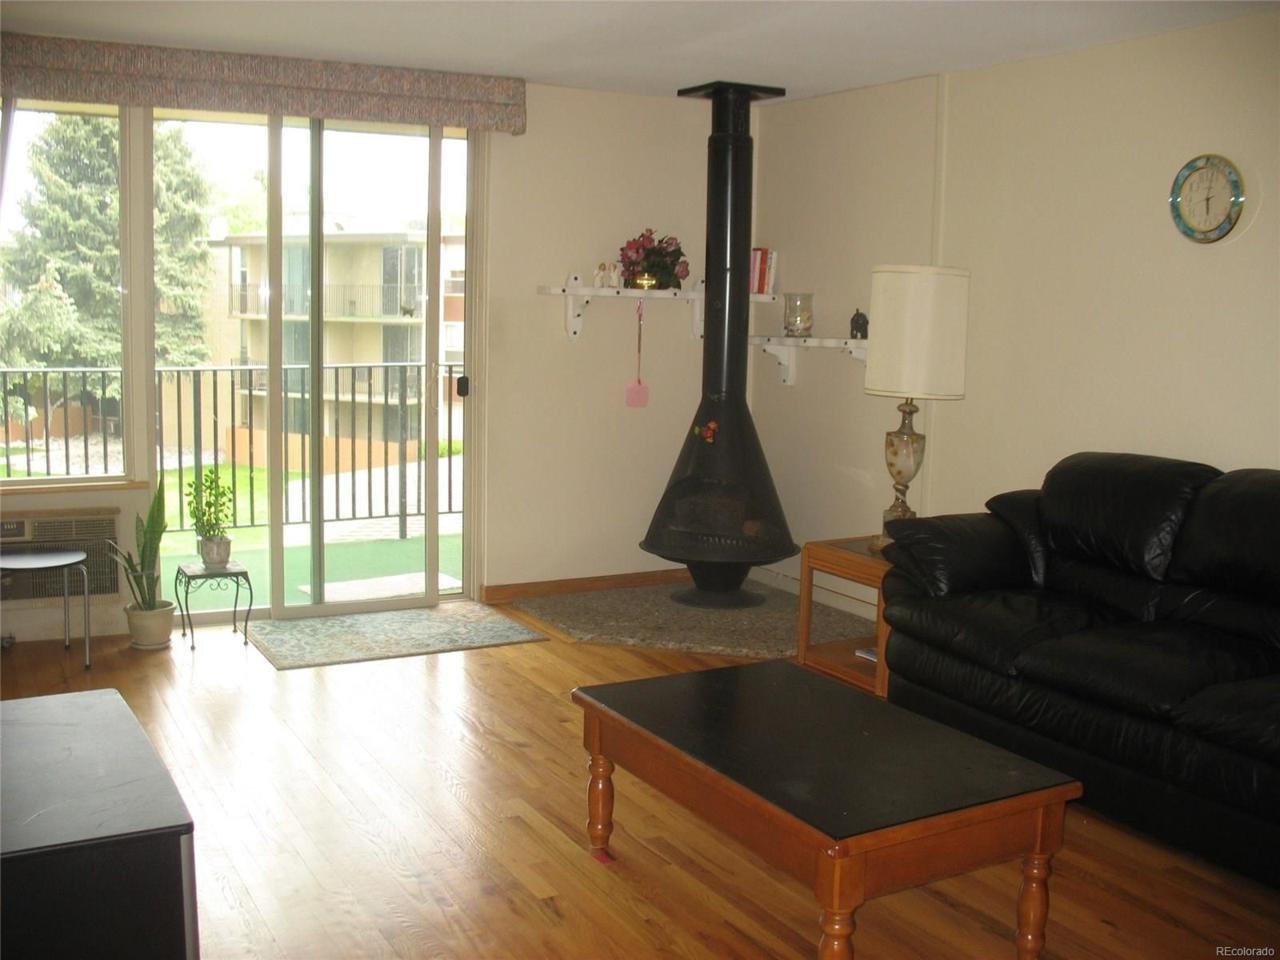 2231 S Vaughn Way 303B, Aurora, CO 80014 (MLS #9555298) :: 8z Real Estate